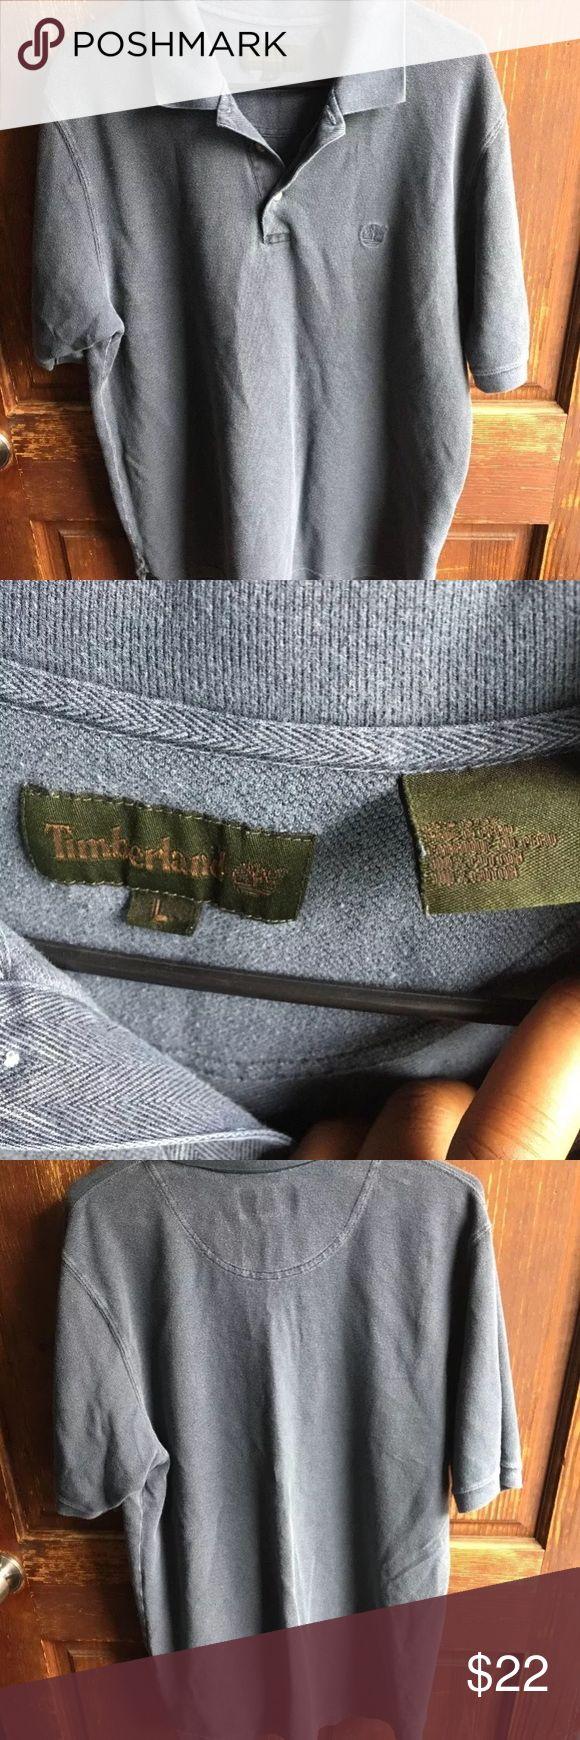 Mens Timberland 100% cotton polo shirt Blue collared shirt with 3 buttons with timberland logo Timberland Shirts Polos